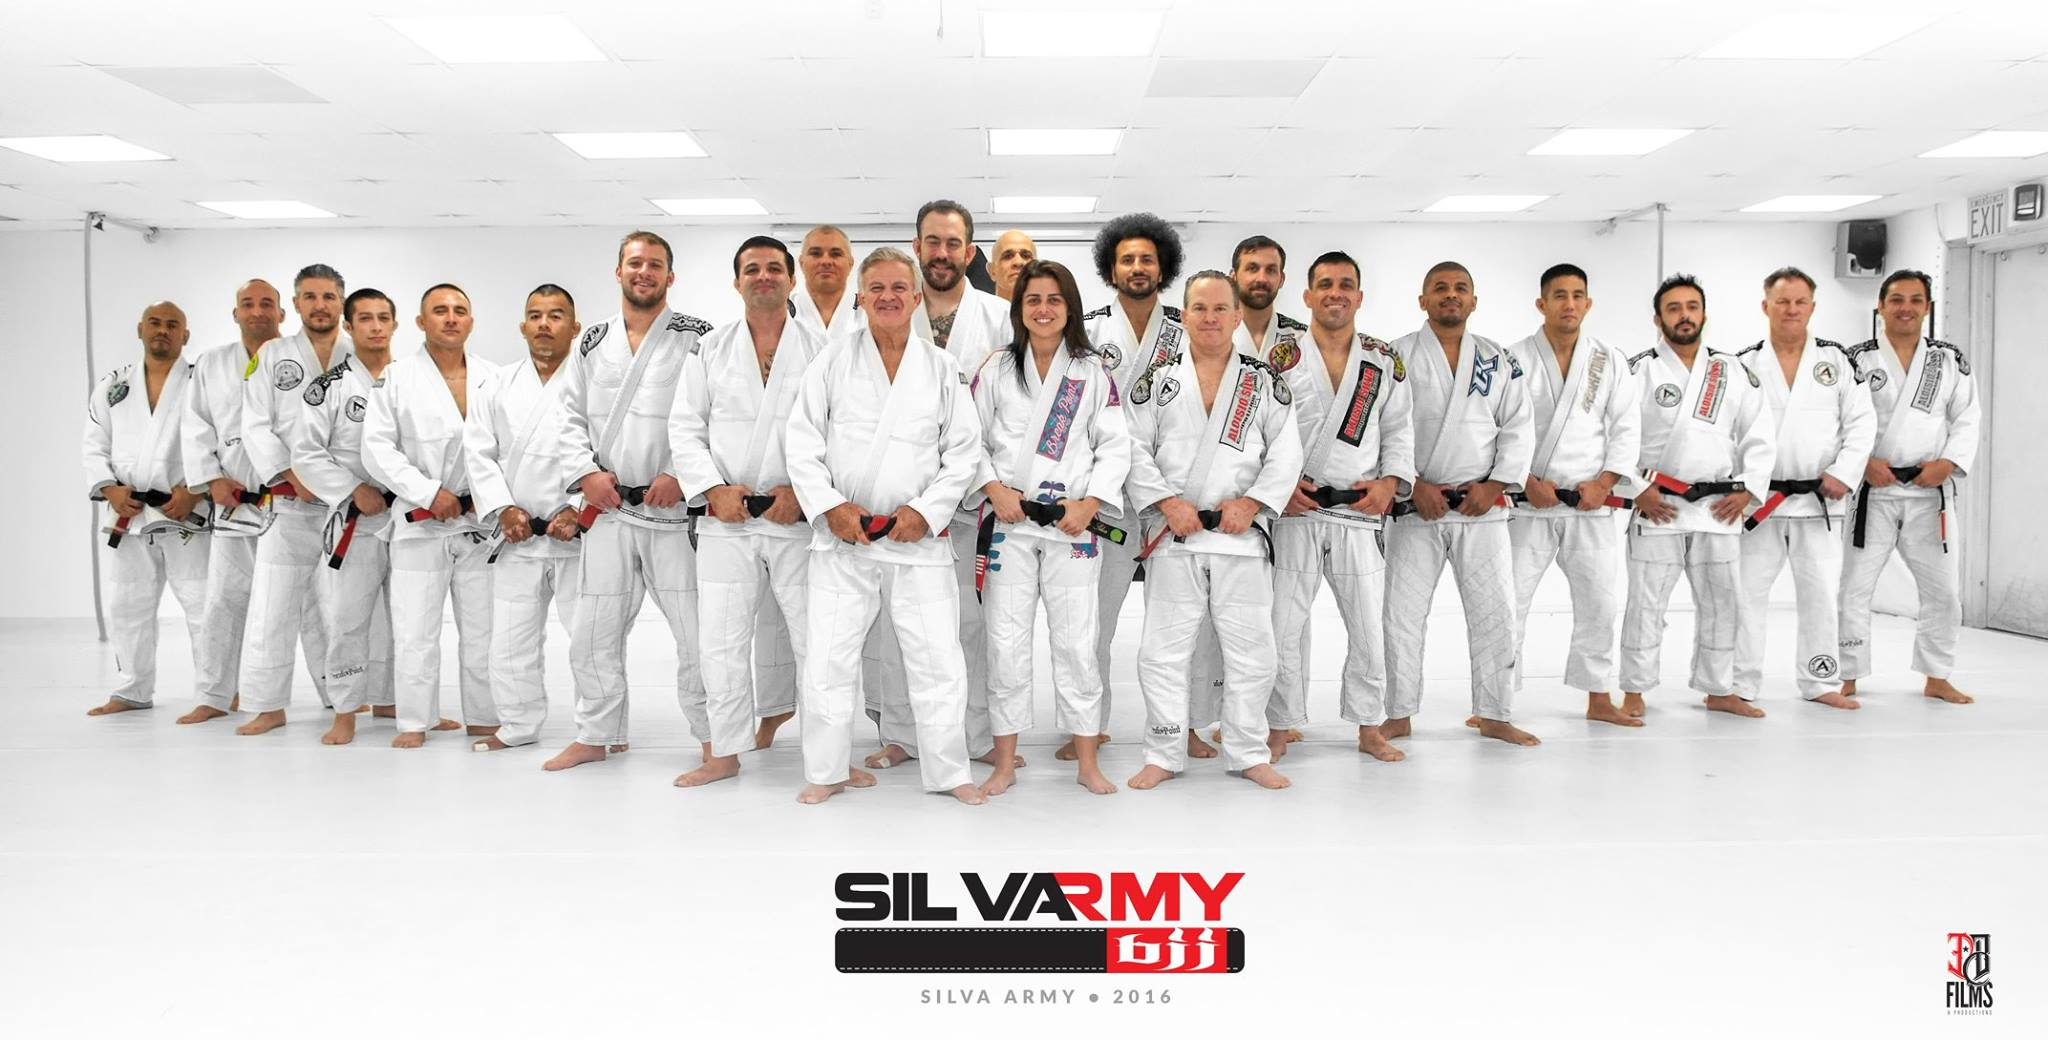 Silva Army